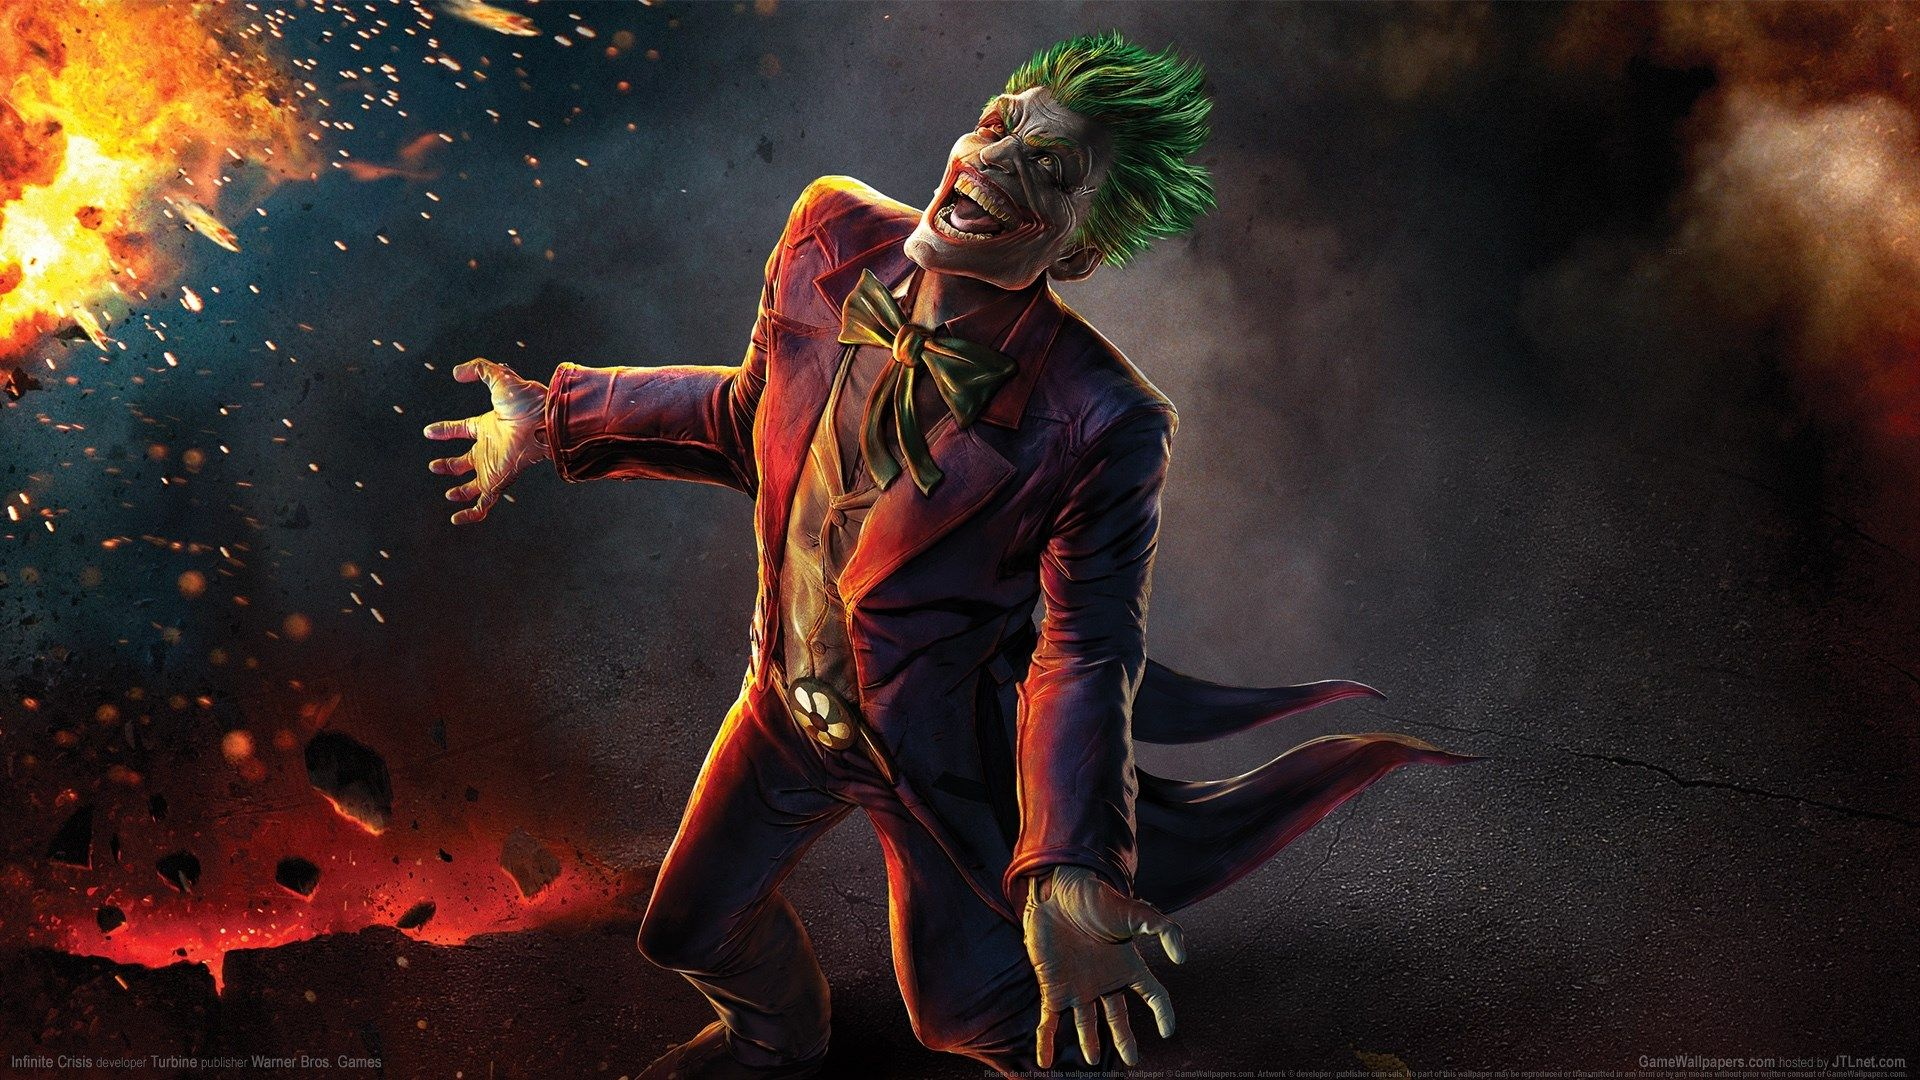 Infinite Crisis Full Hd Background 1920x1080 Joker Images Gaming Wallpapers Joker Hd Wallpaper